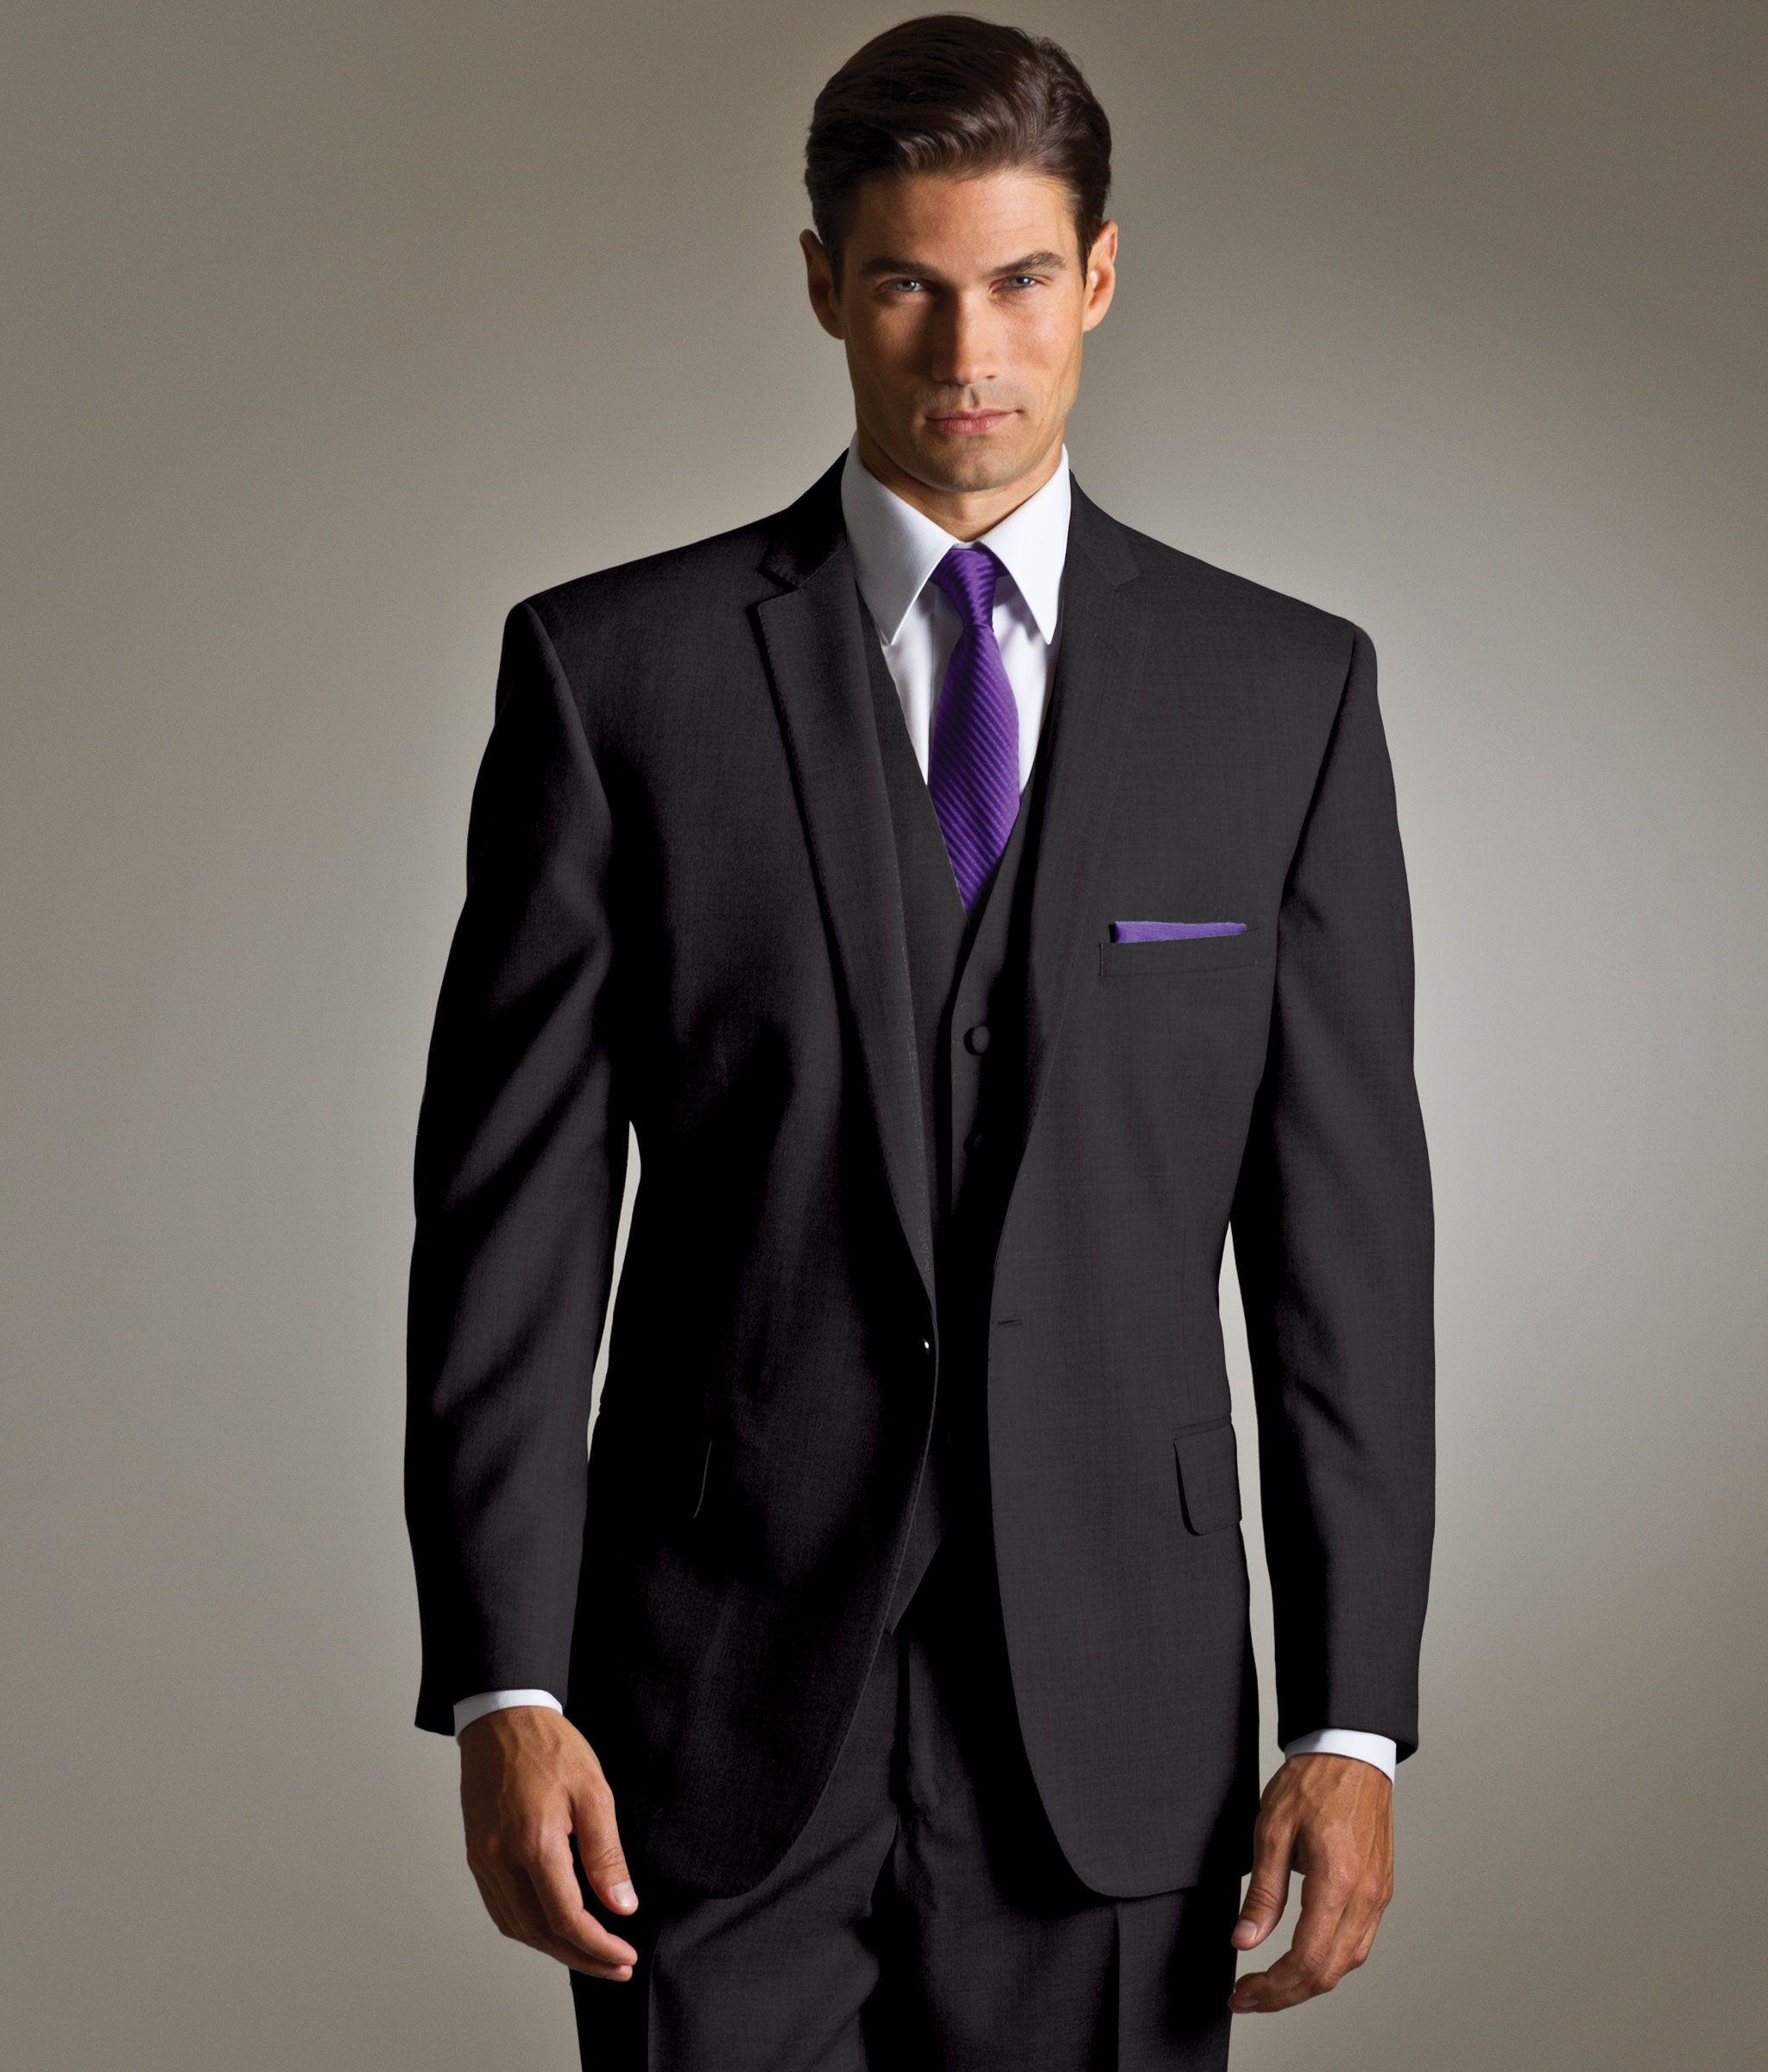 savvi valencia suit - Google Search | Groomsmen | Pinterest | Rent ...